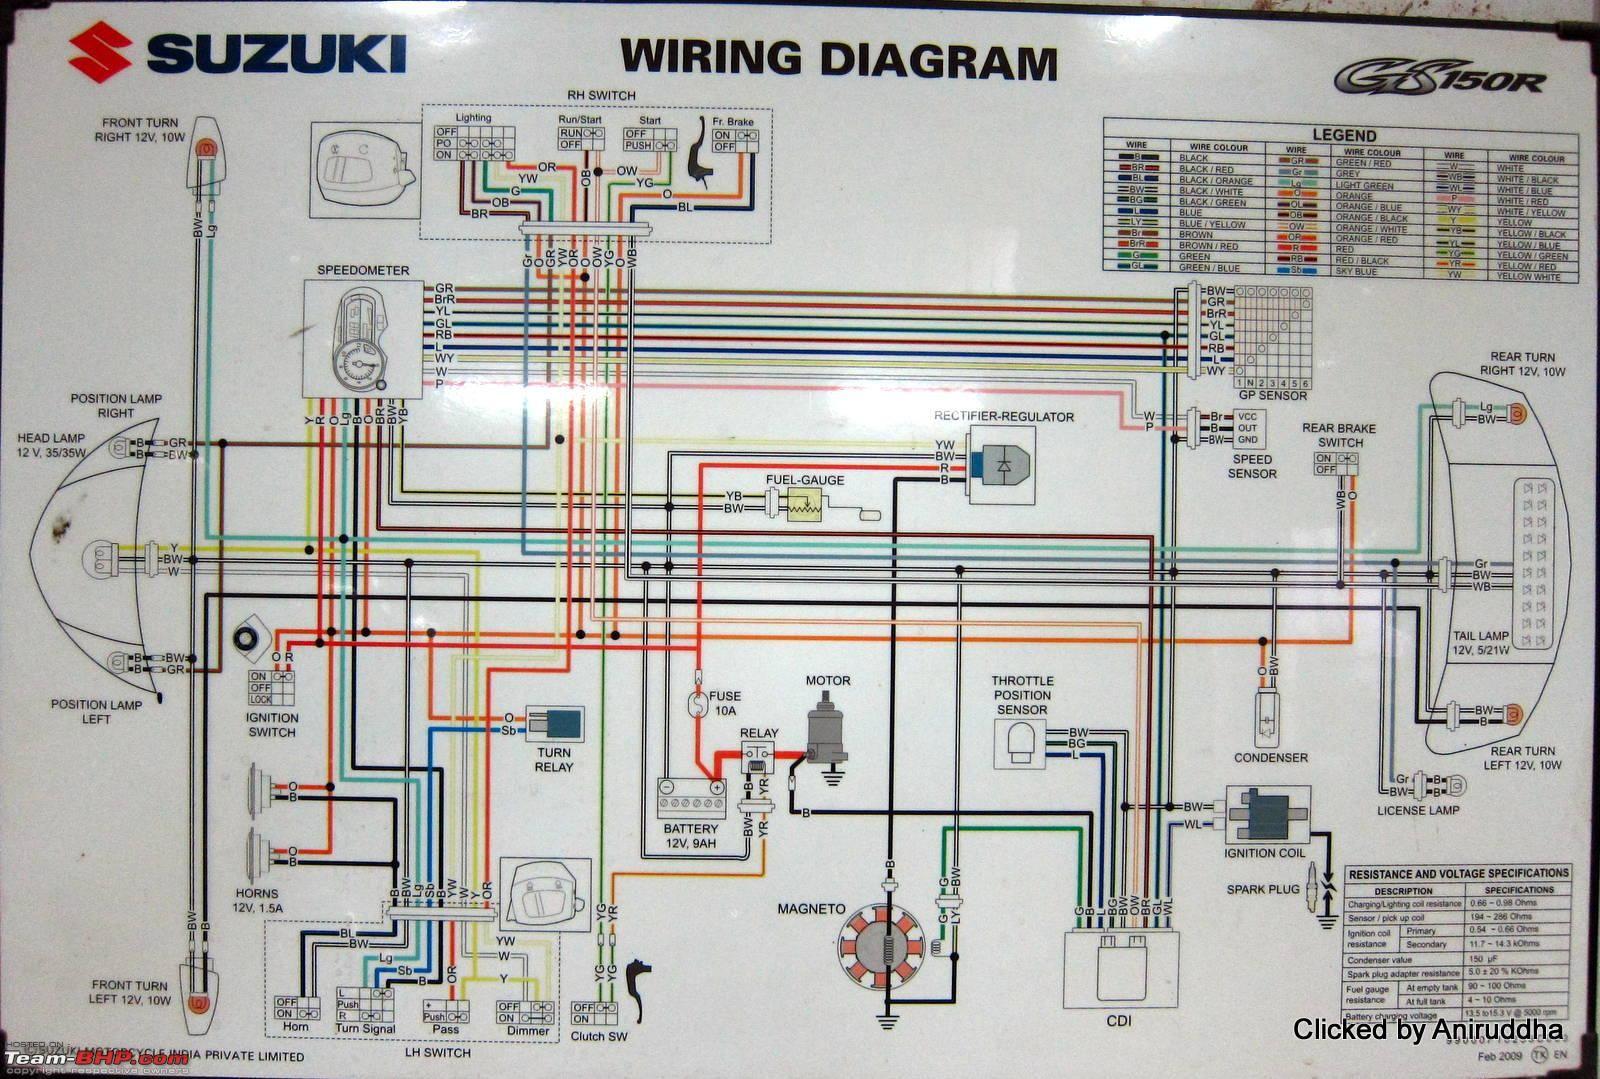 24 Complex Hero Honda Wiring Diagram Design Ideas Https Bacamajalah Com 24 Complex Hero Honda Electrical Wiring Diagram Motorcycle Wiring Electrical Wiring